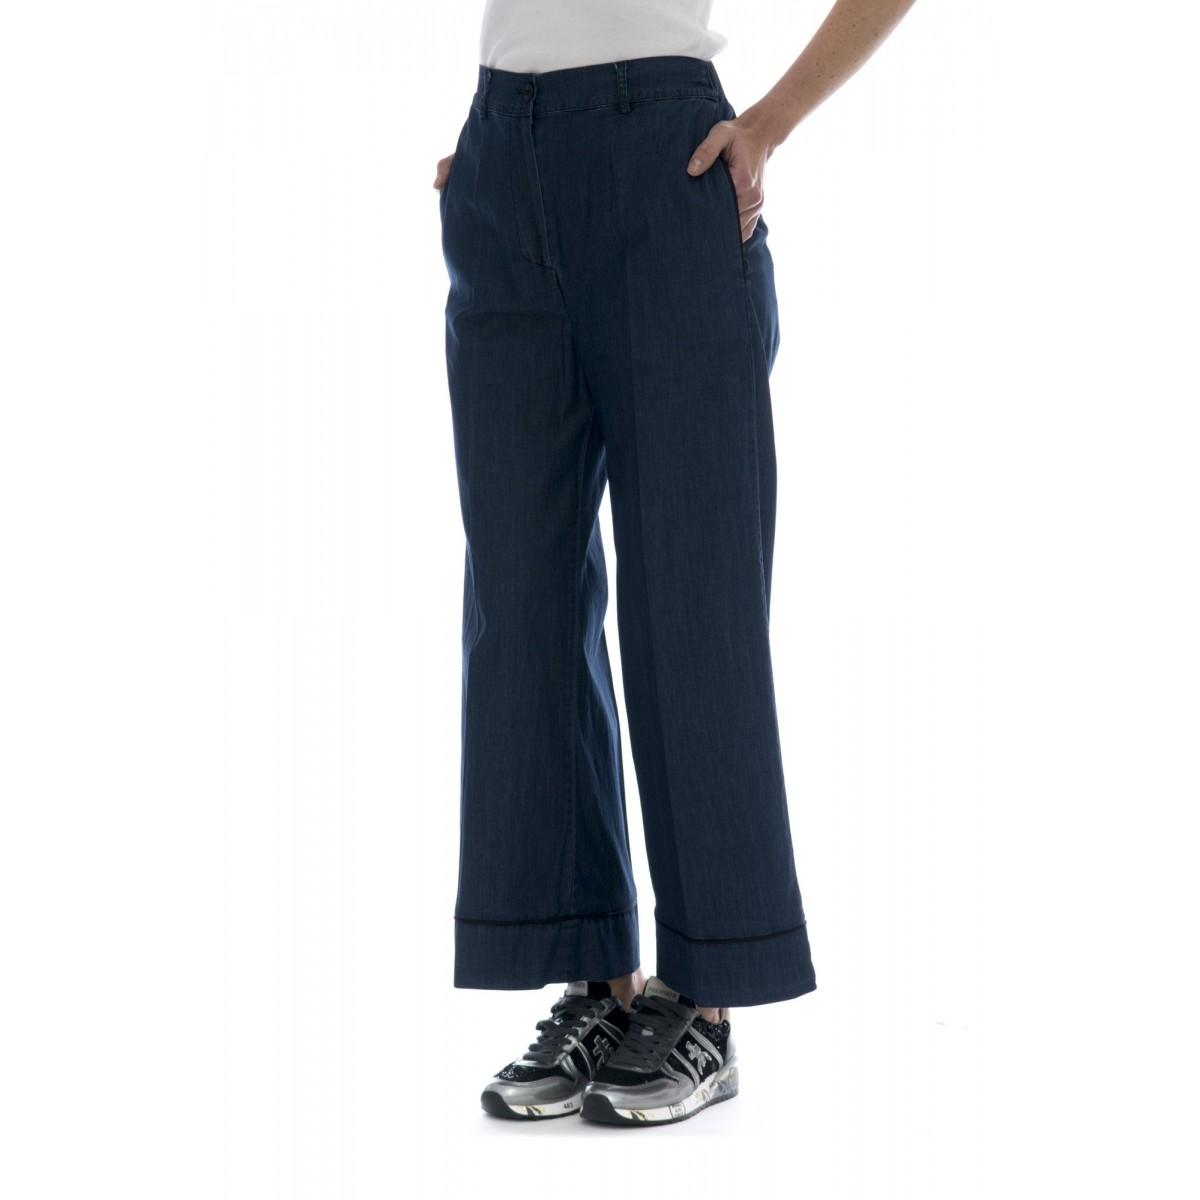 Pantalone donna - 4027 pantalone largo shambrai